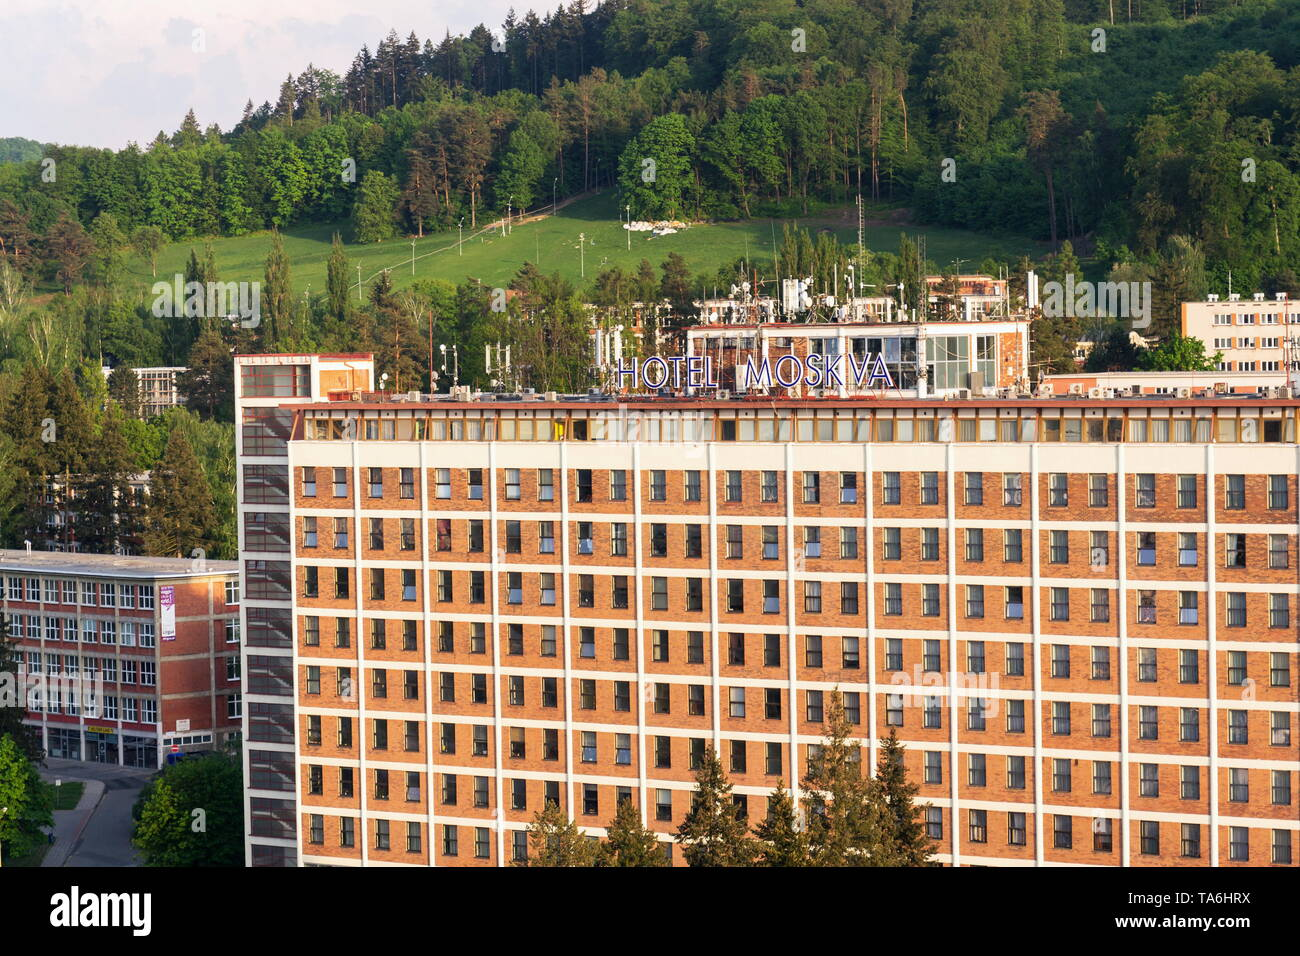 ZLIN, CZECH REPUBLIC - APRIL 29 2018: Hotel Moskva on Namesti Prace on April 29, 2018 in Zlin, Czech Republic. - Stock Image